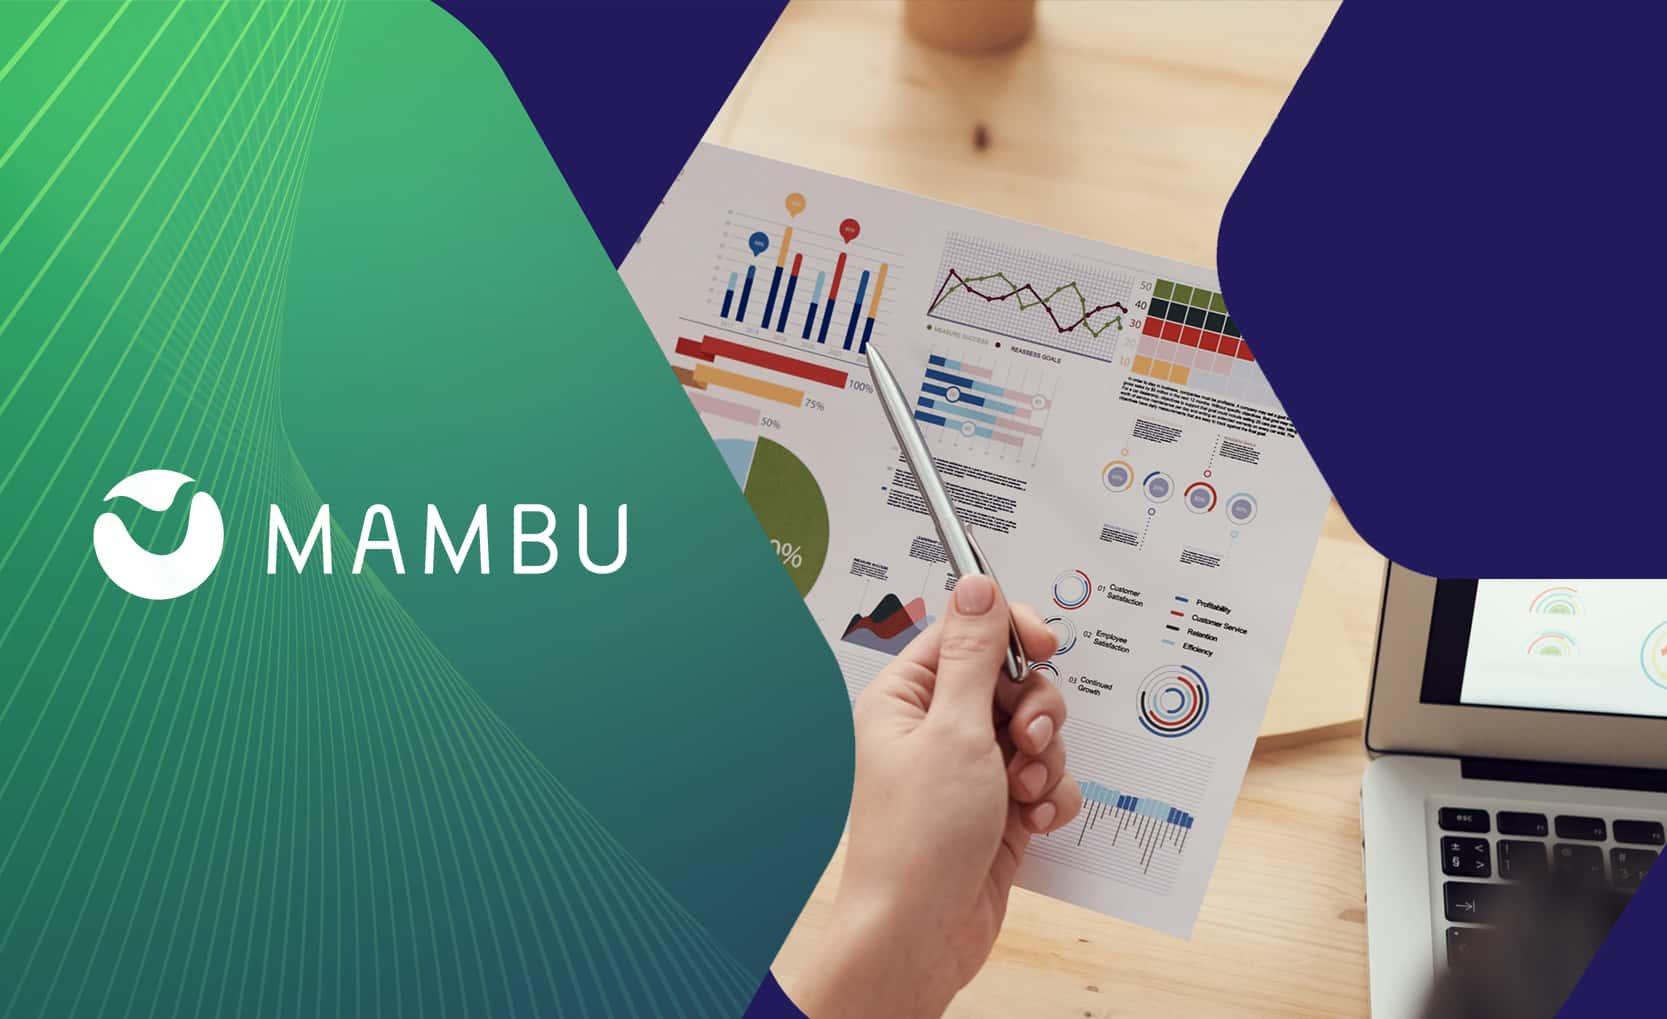 mambu and core banking in fintech